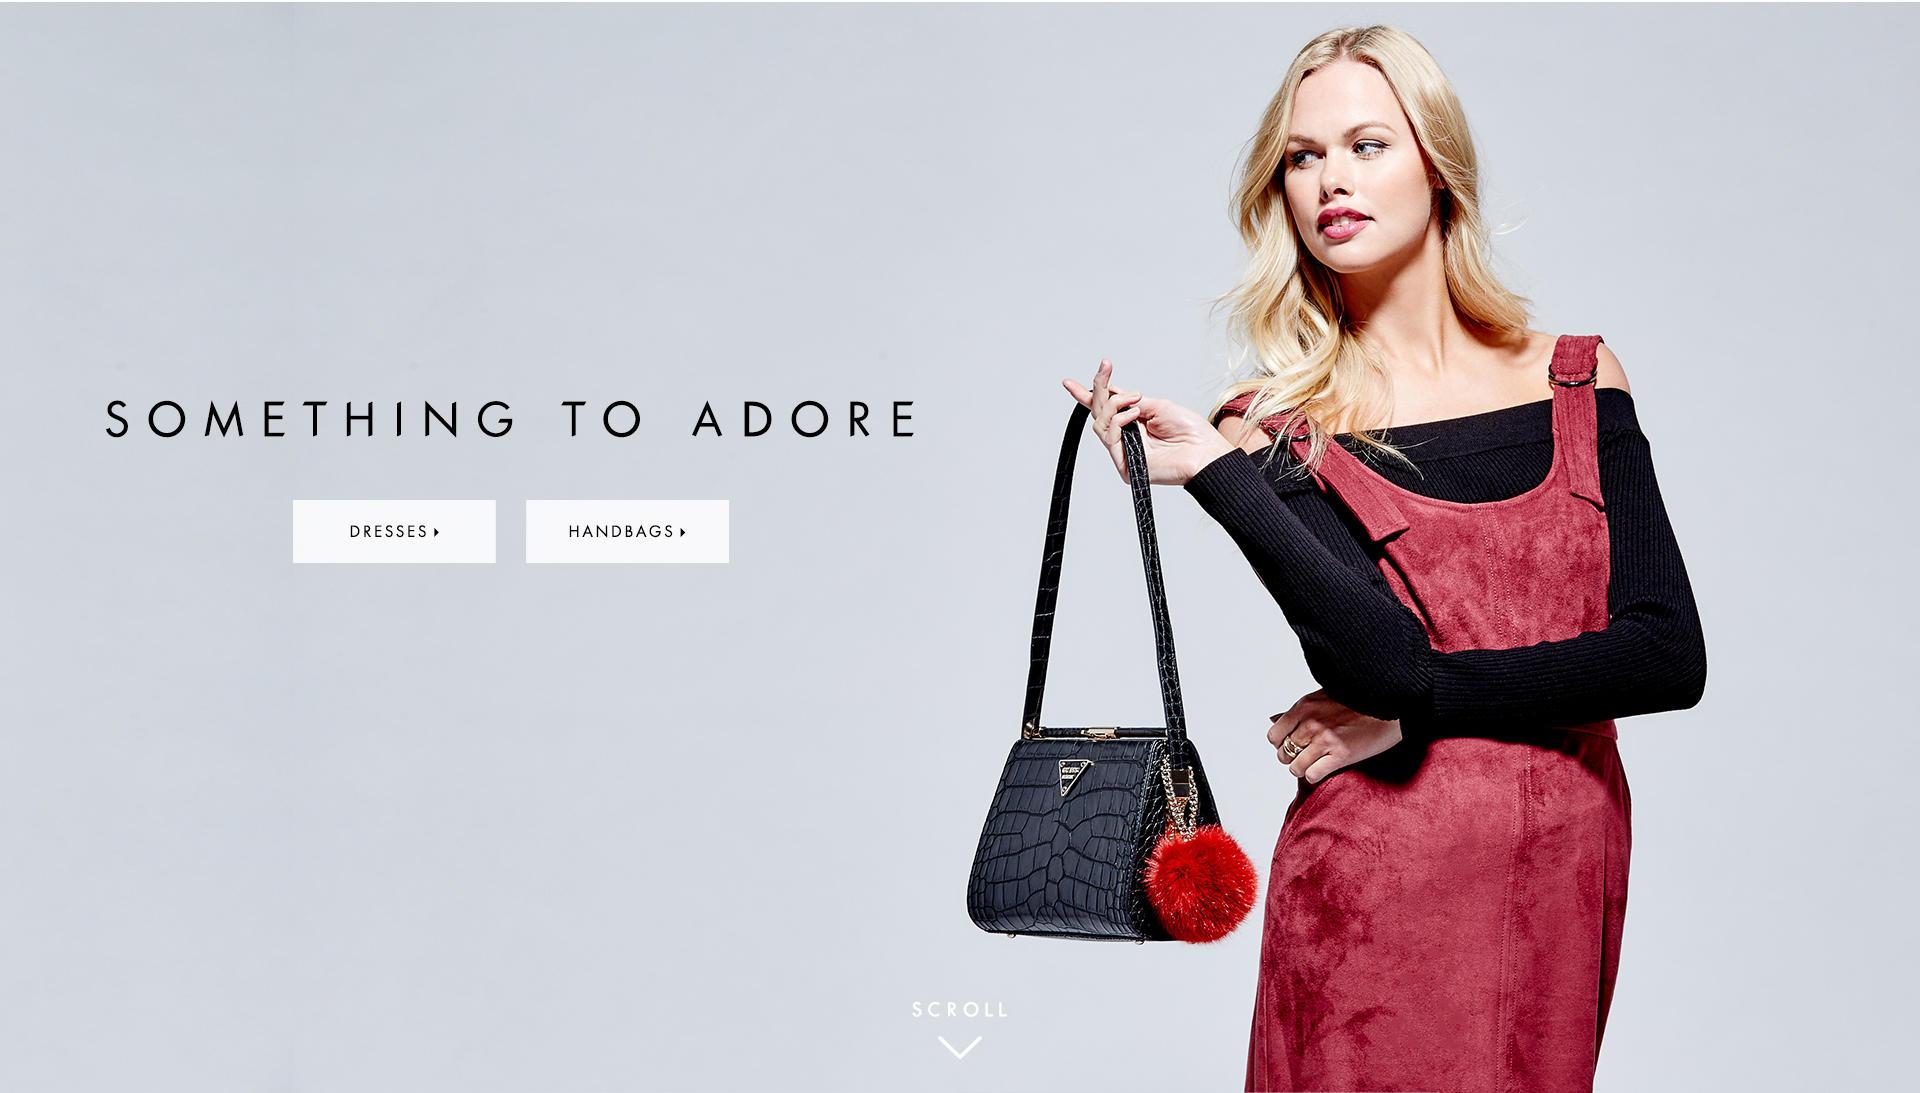 Something to Adore: Dresses & Handbags